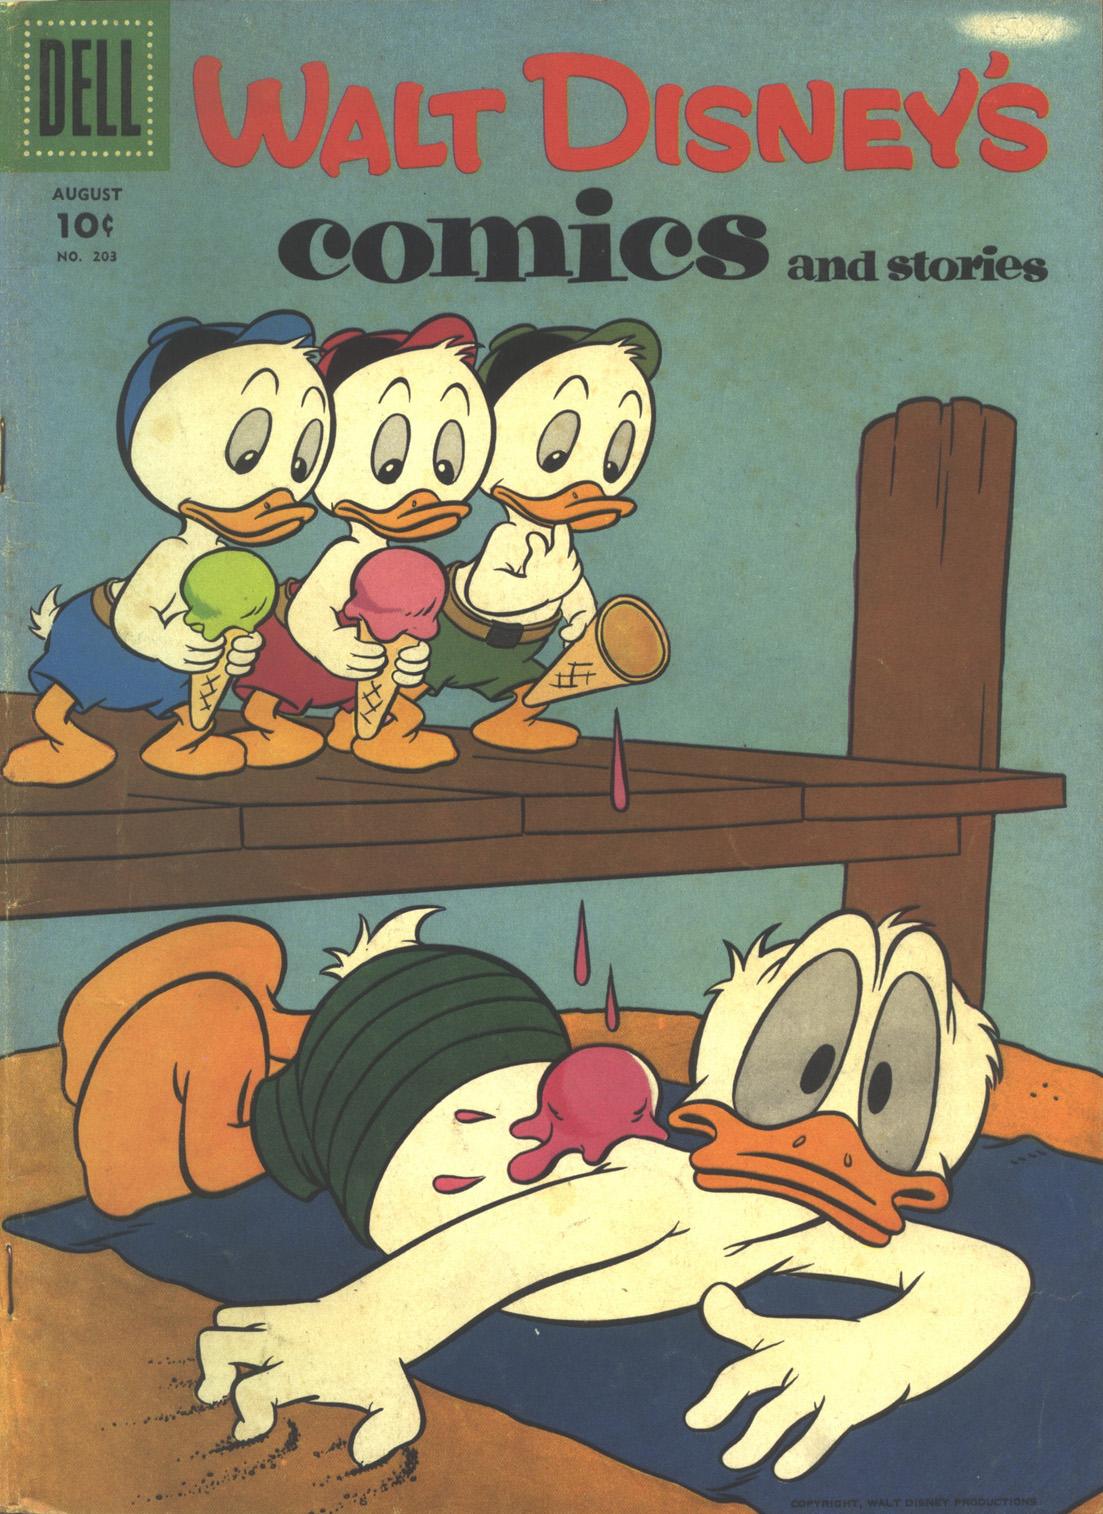 Walt Disneys Comics and Stories 203 Page 1